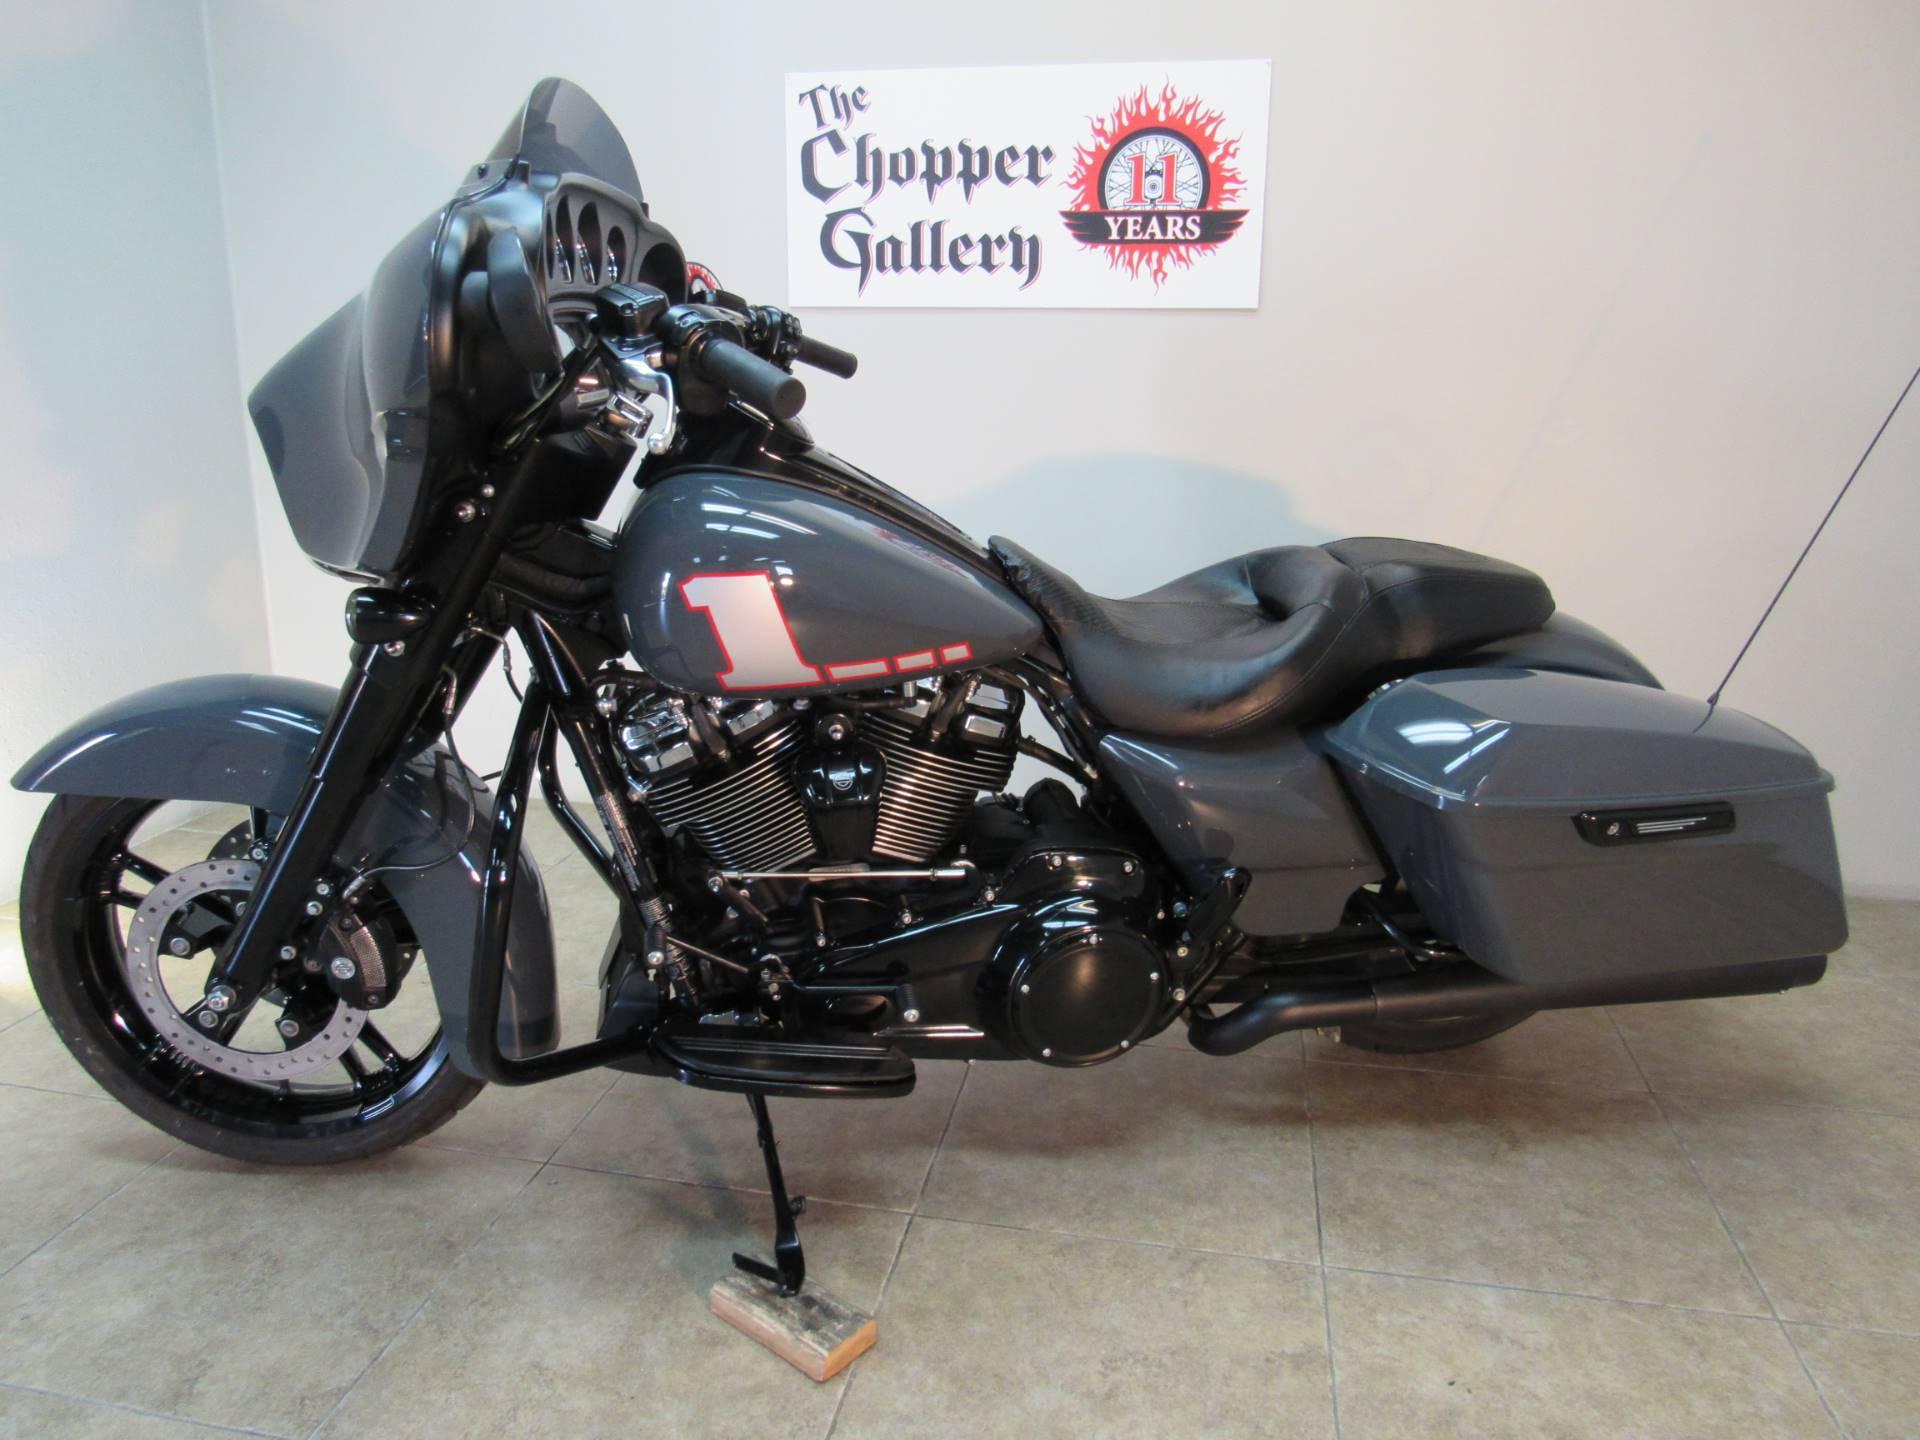 2018 Harley-Davidson Street Glide Special 2